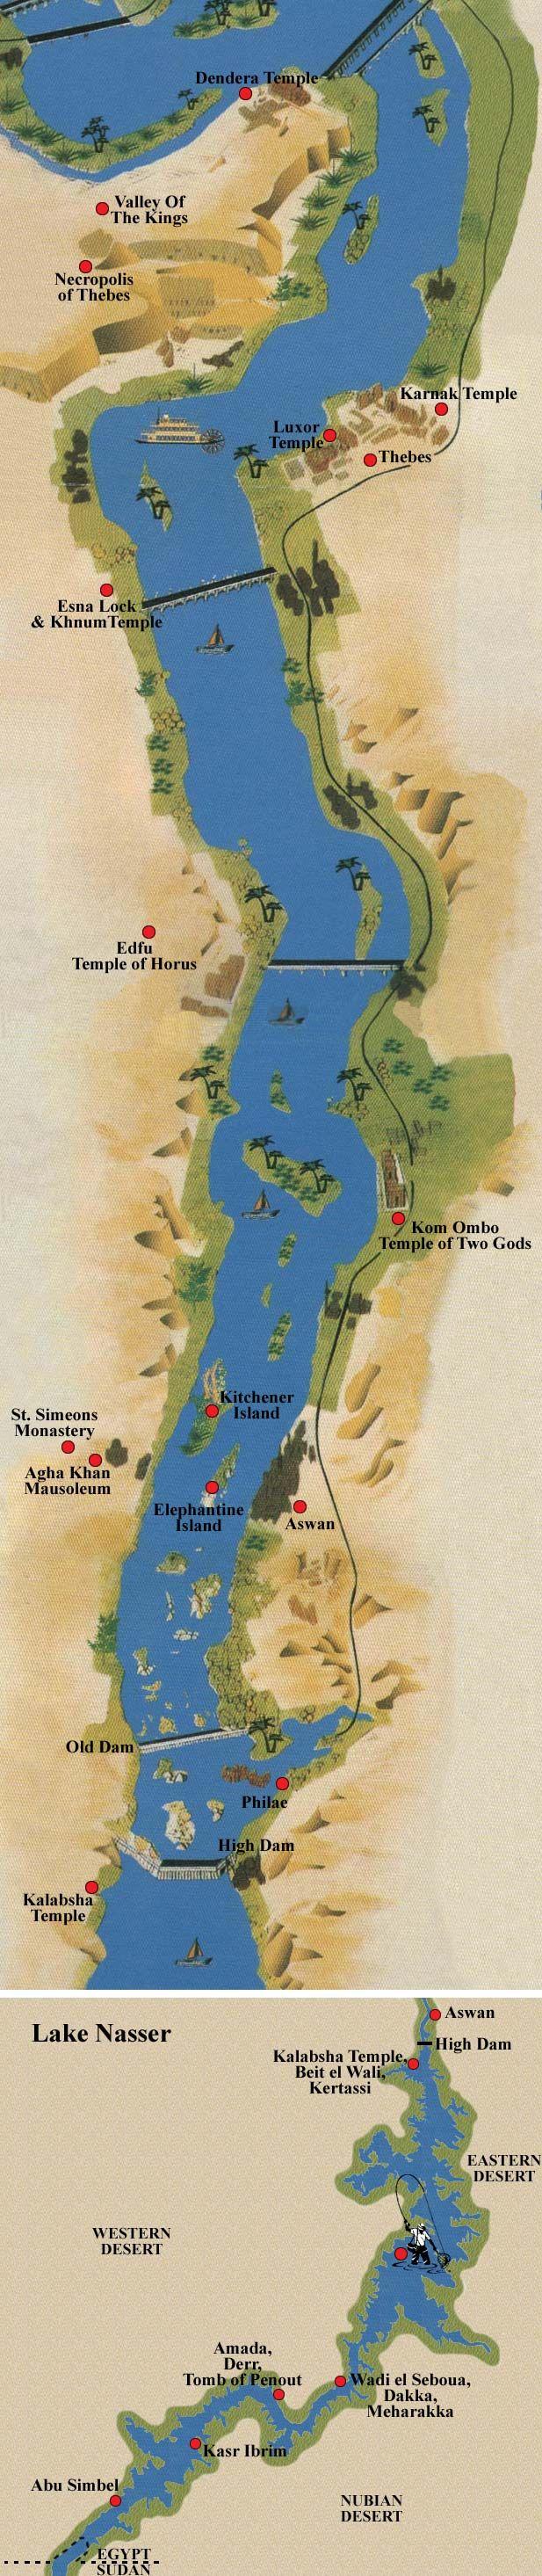 Nile River clipart ancient time Civilization windows10 RiverIllustrated Inch 9